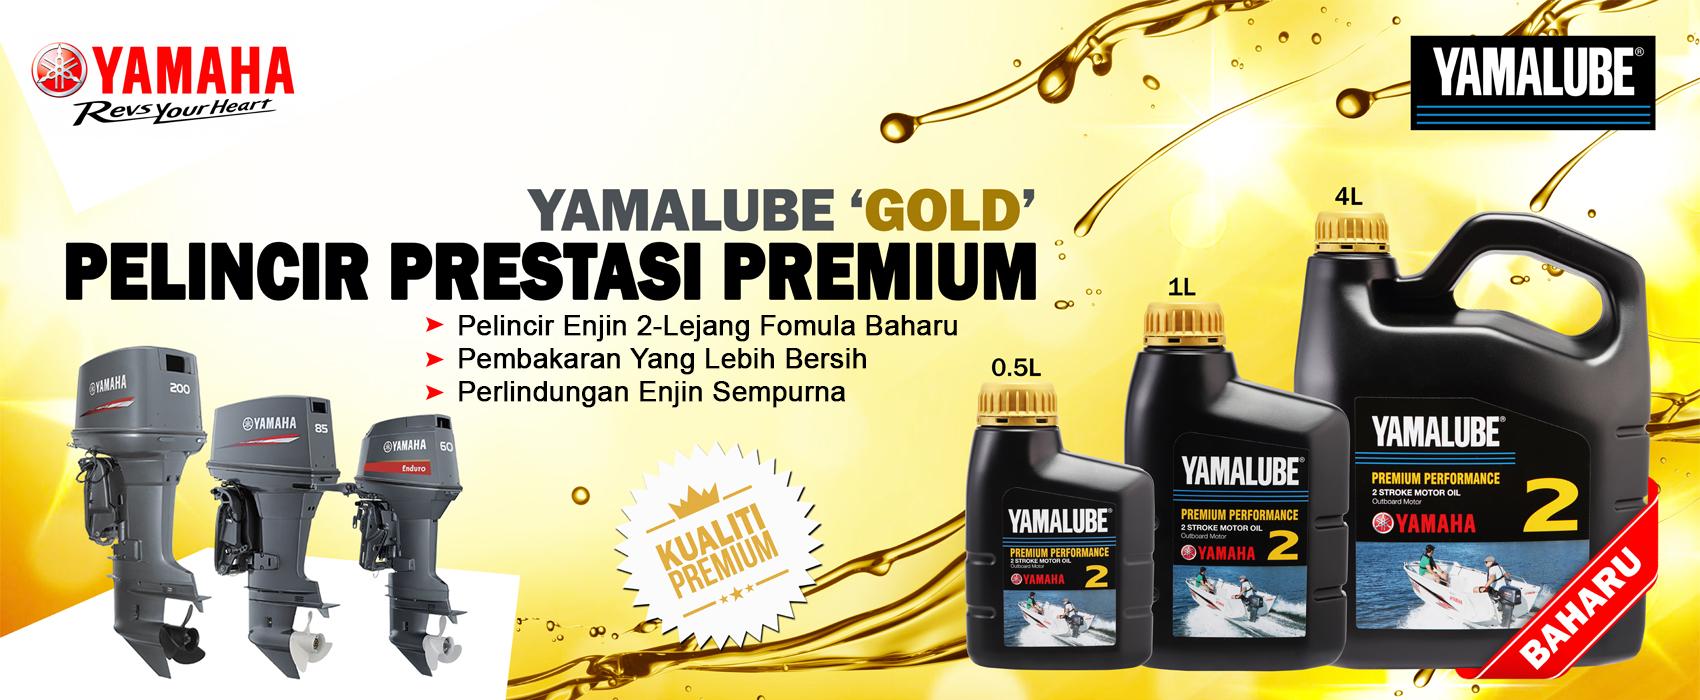 Web Bnner – Yamalube Gold